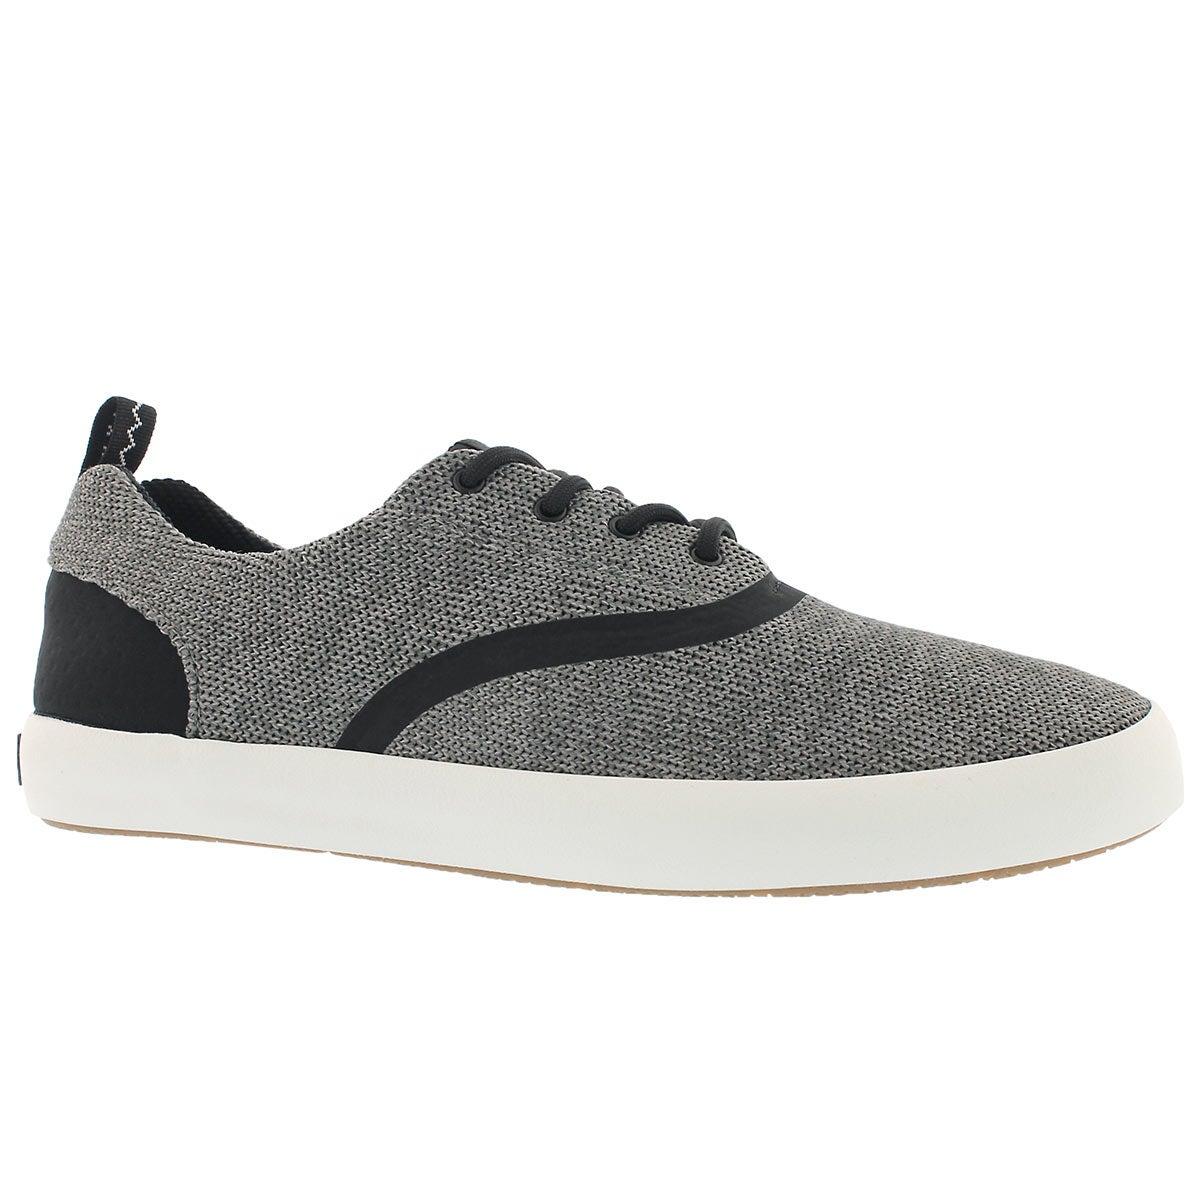 Men's FLEX DECK CVO black/multi lace up sneakers